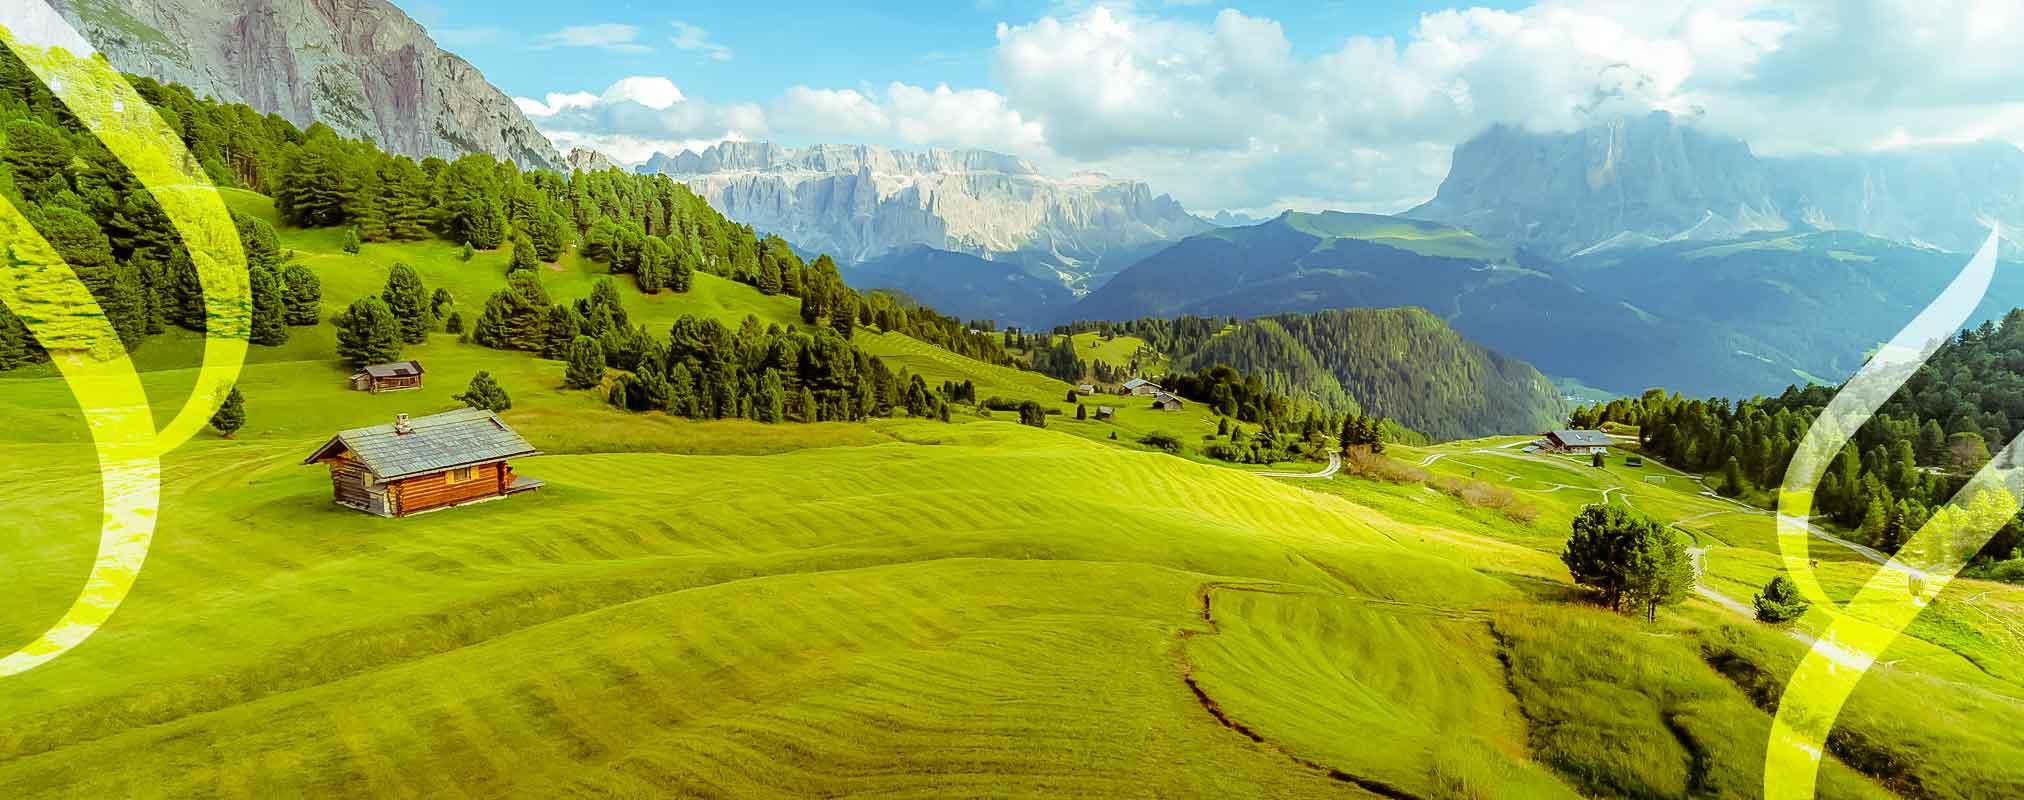 View of mountainous landscape in Austria